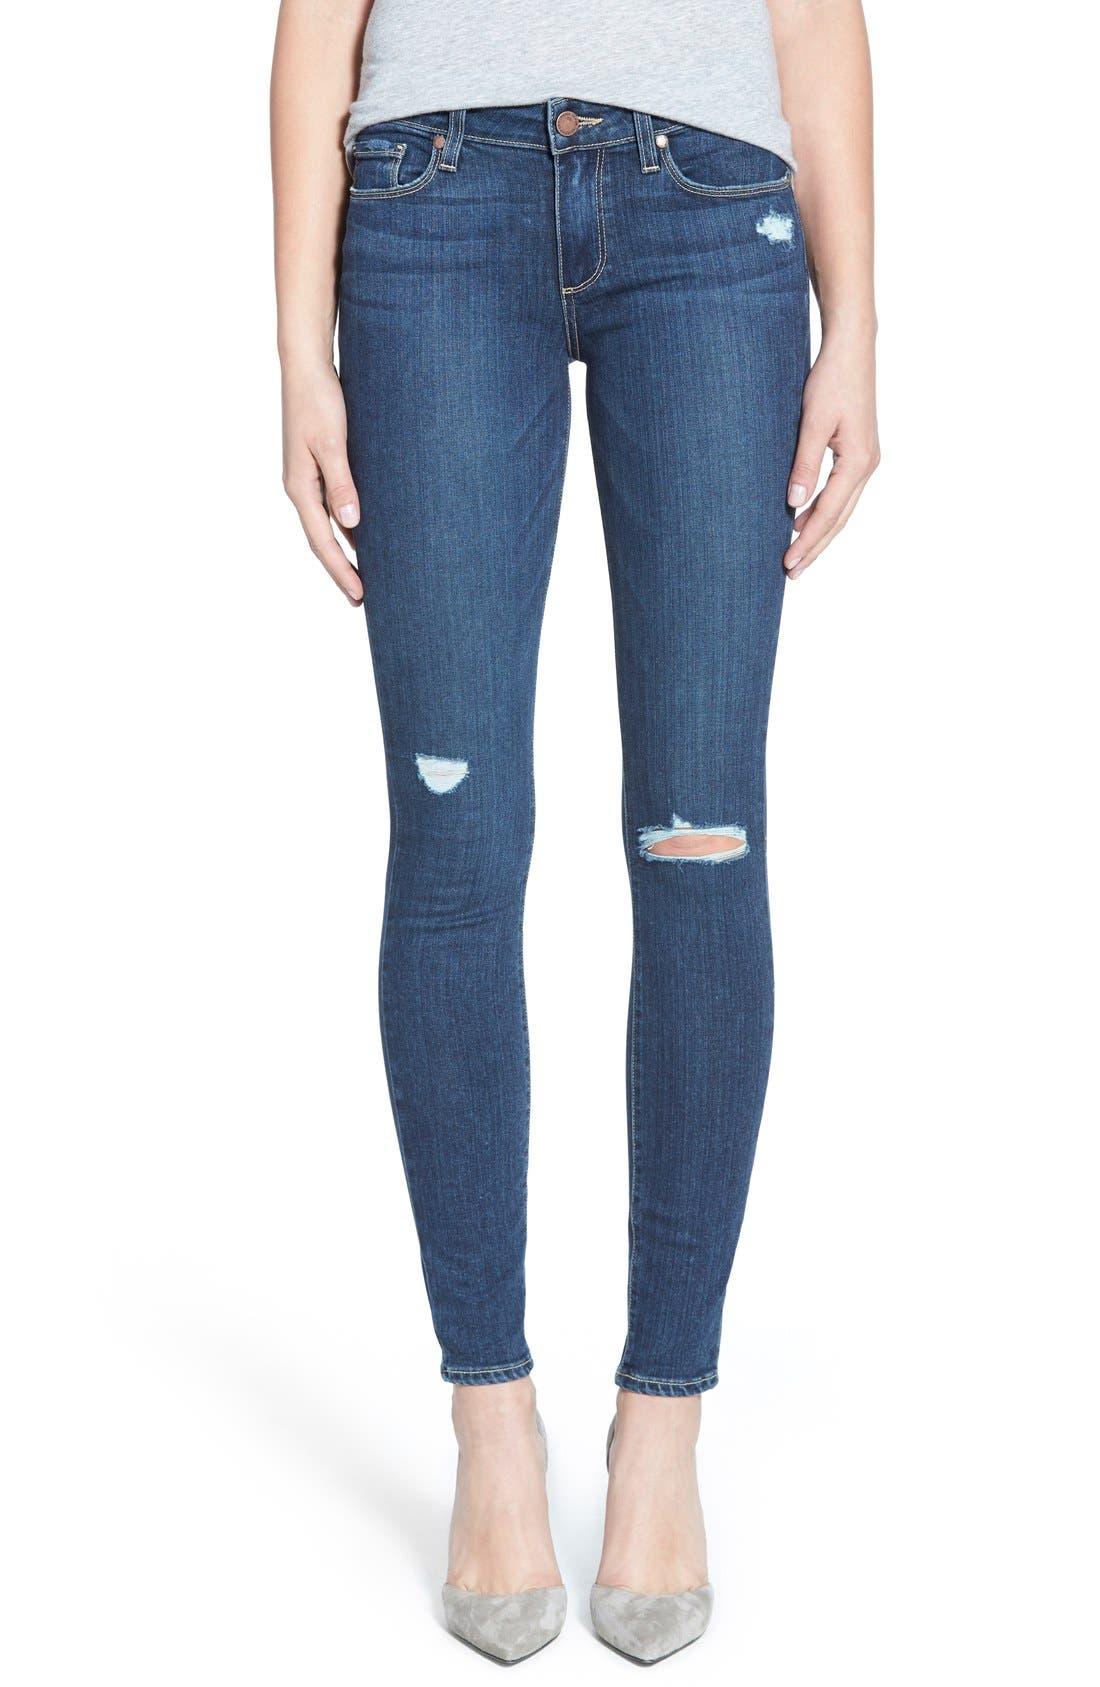 Main Image - Paige Denim 'Transcend - Verdugo' Ultra Skinny Jeans (Elia Destructed)